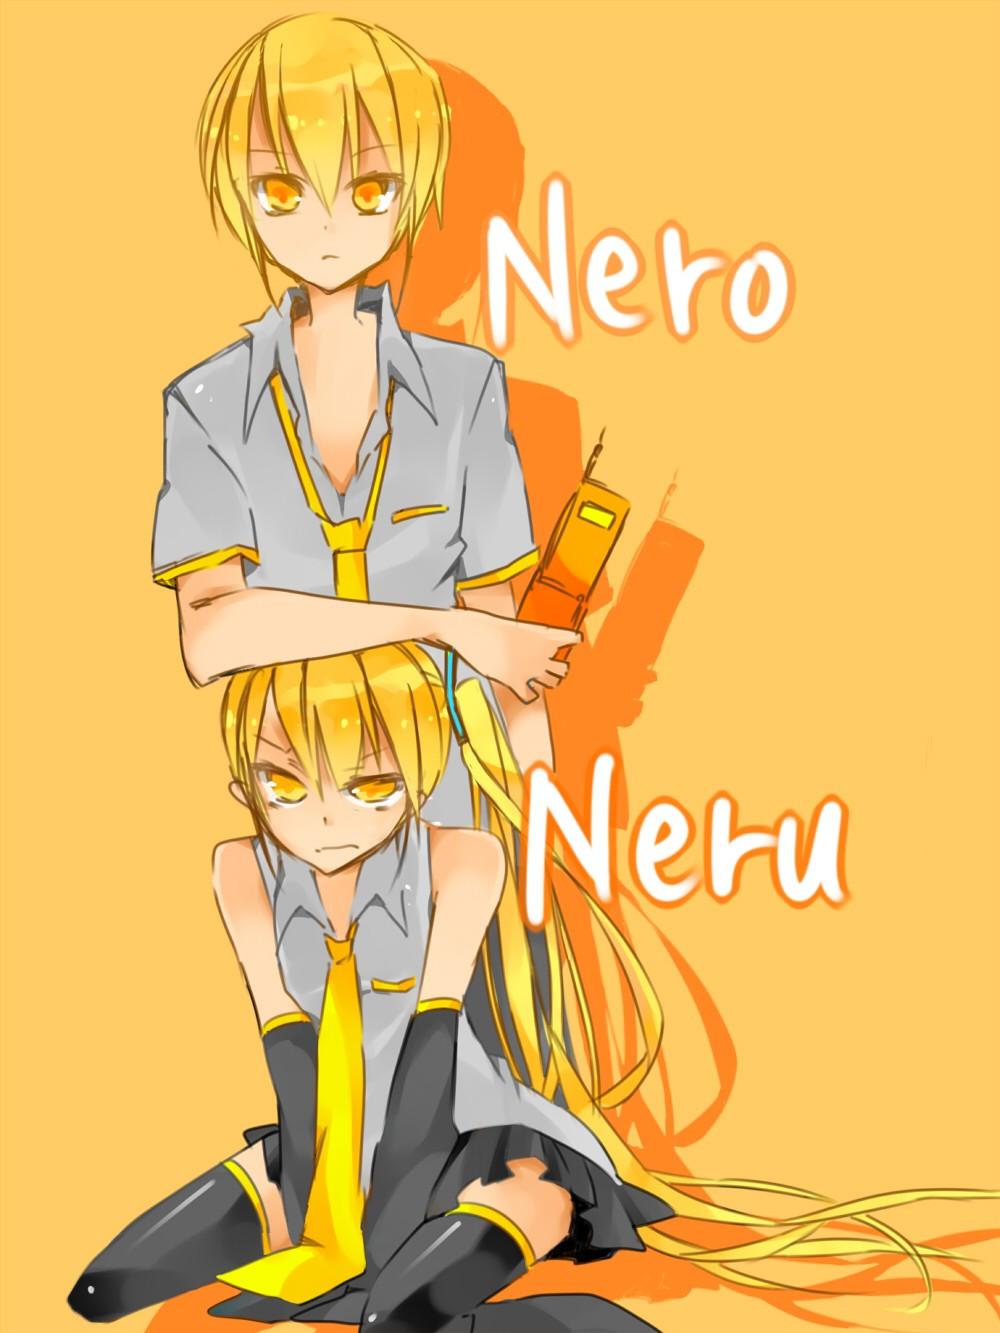 Pinterest Anime Wallpaper Akita Nero Vocaloid Zerochan Anime Image Board